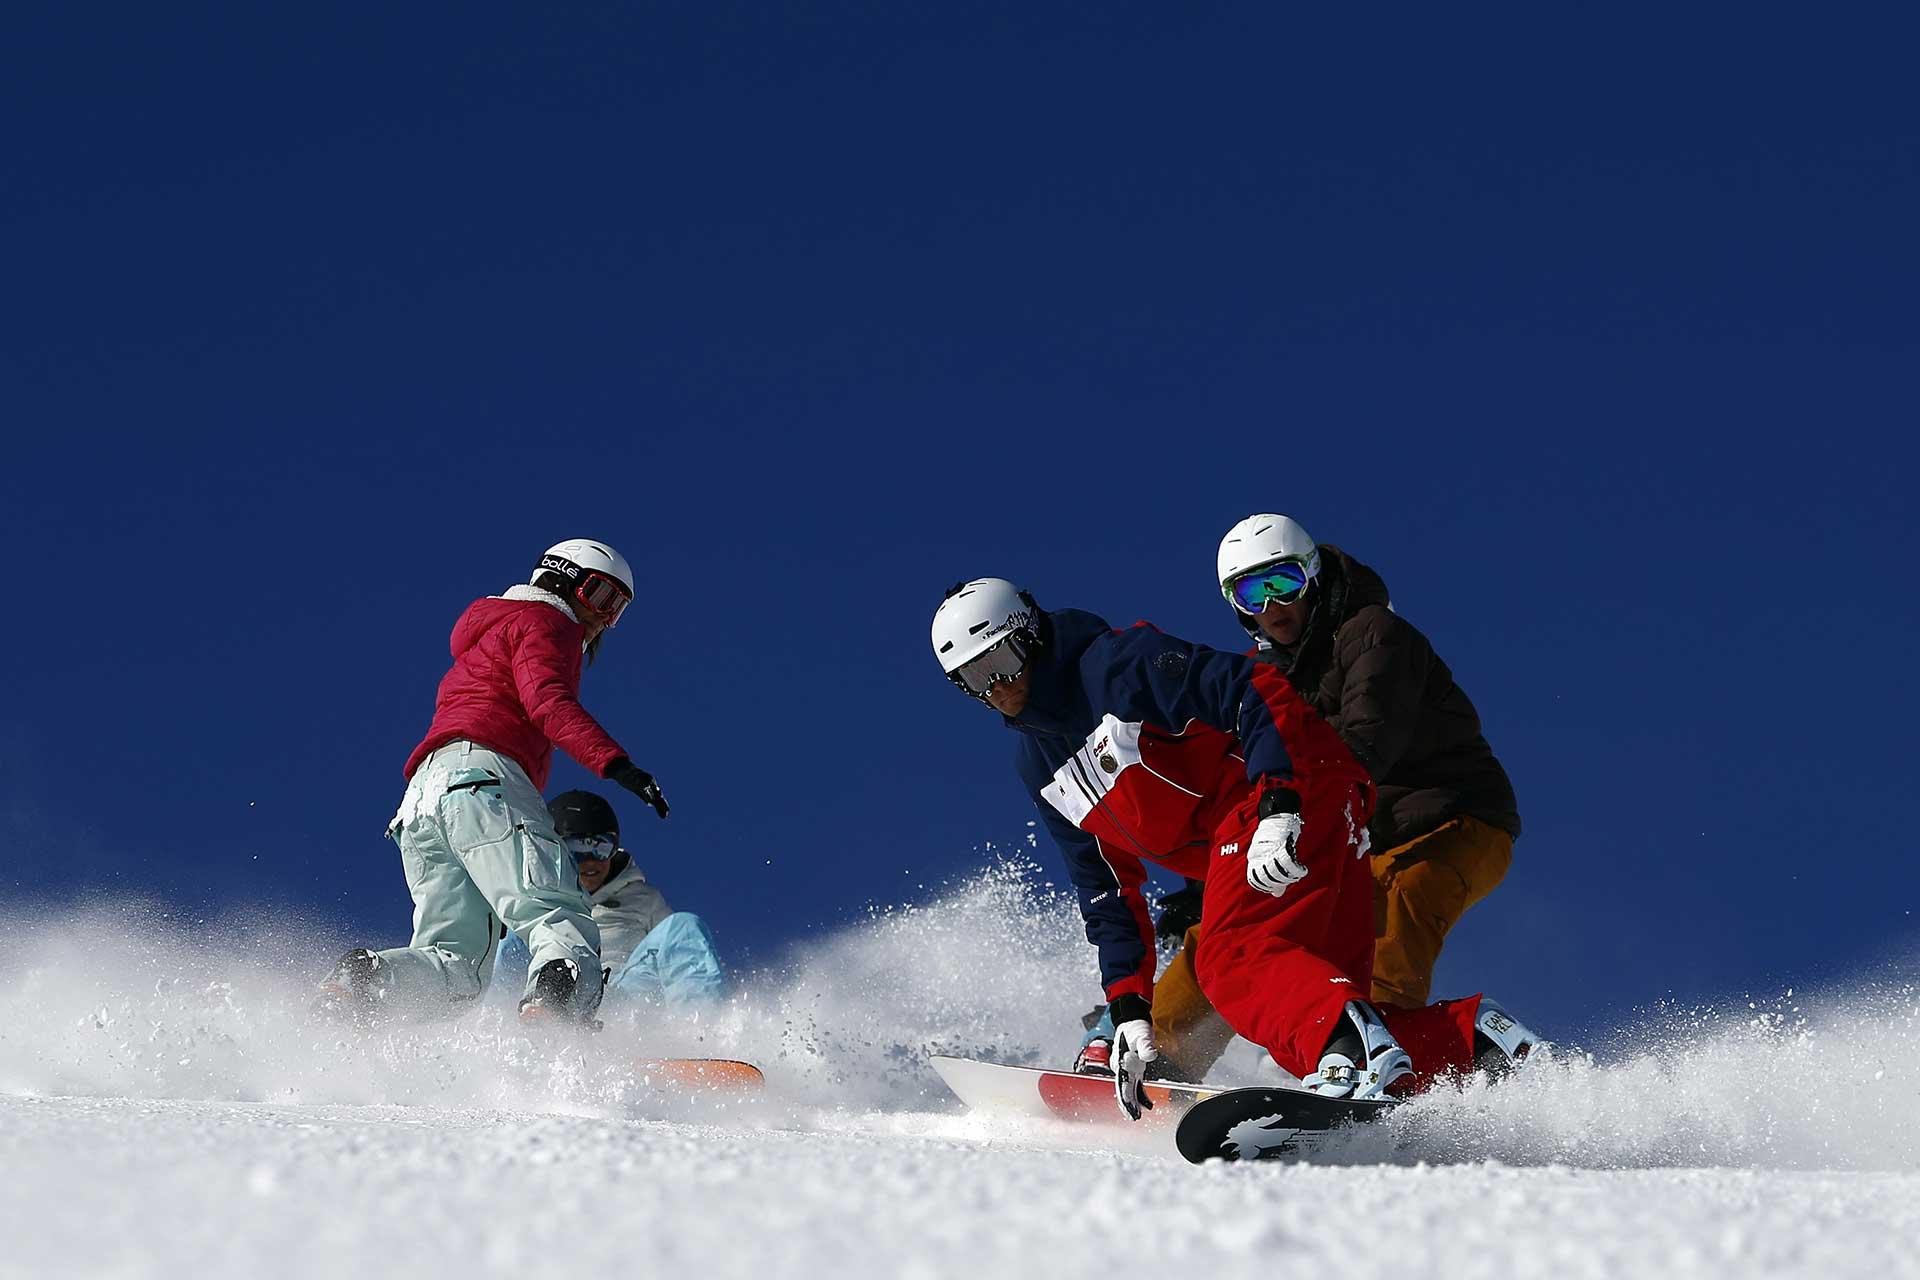 snowboard en cours collectifs